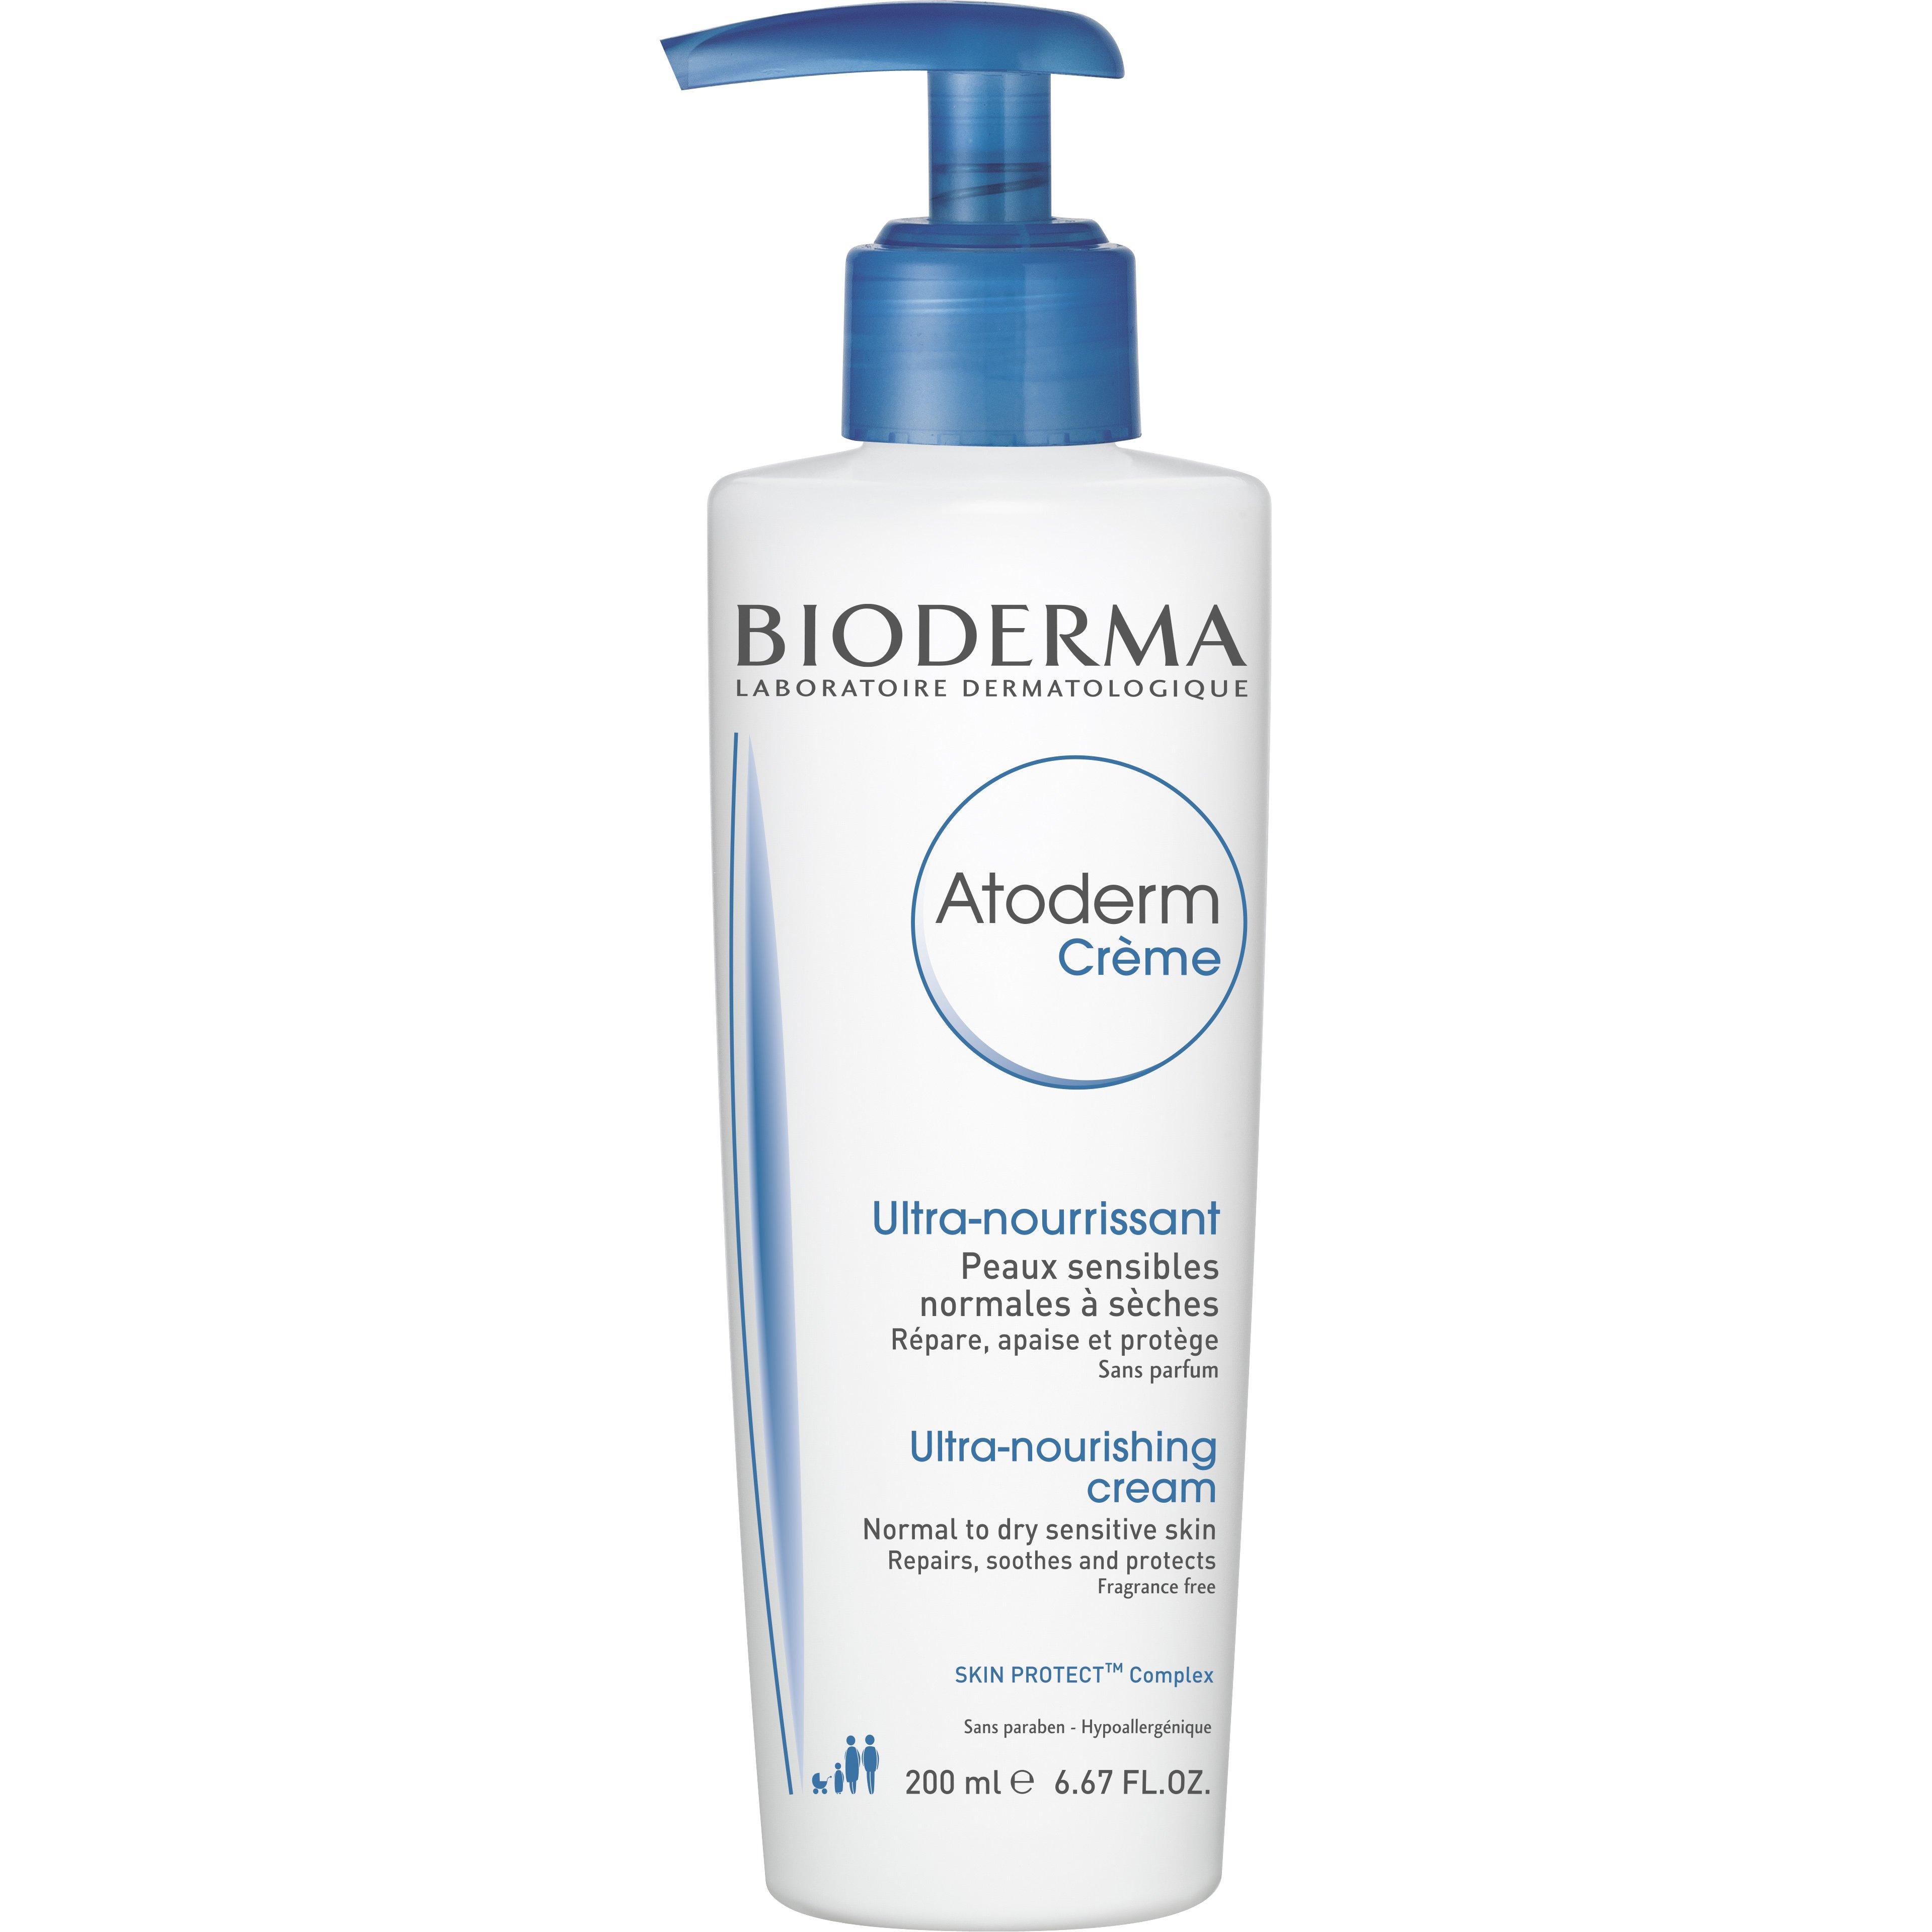 Bioderma Atoderm Creme 24ωρη Ενυδατική Κρέμα Μεγάλης Διάρκειας για το Ξηρό προς Πολύ Ξηρό Ευαίσθητο Δέρμα 200ml